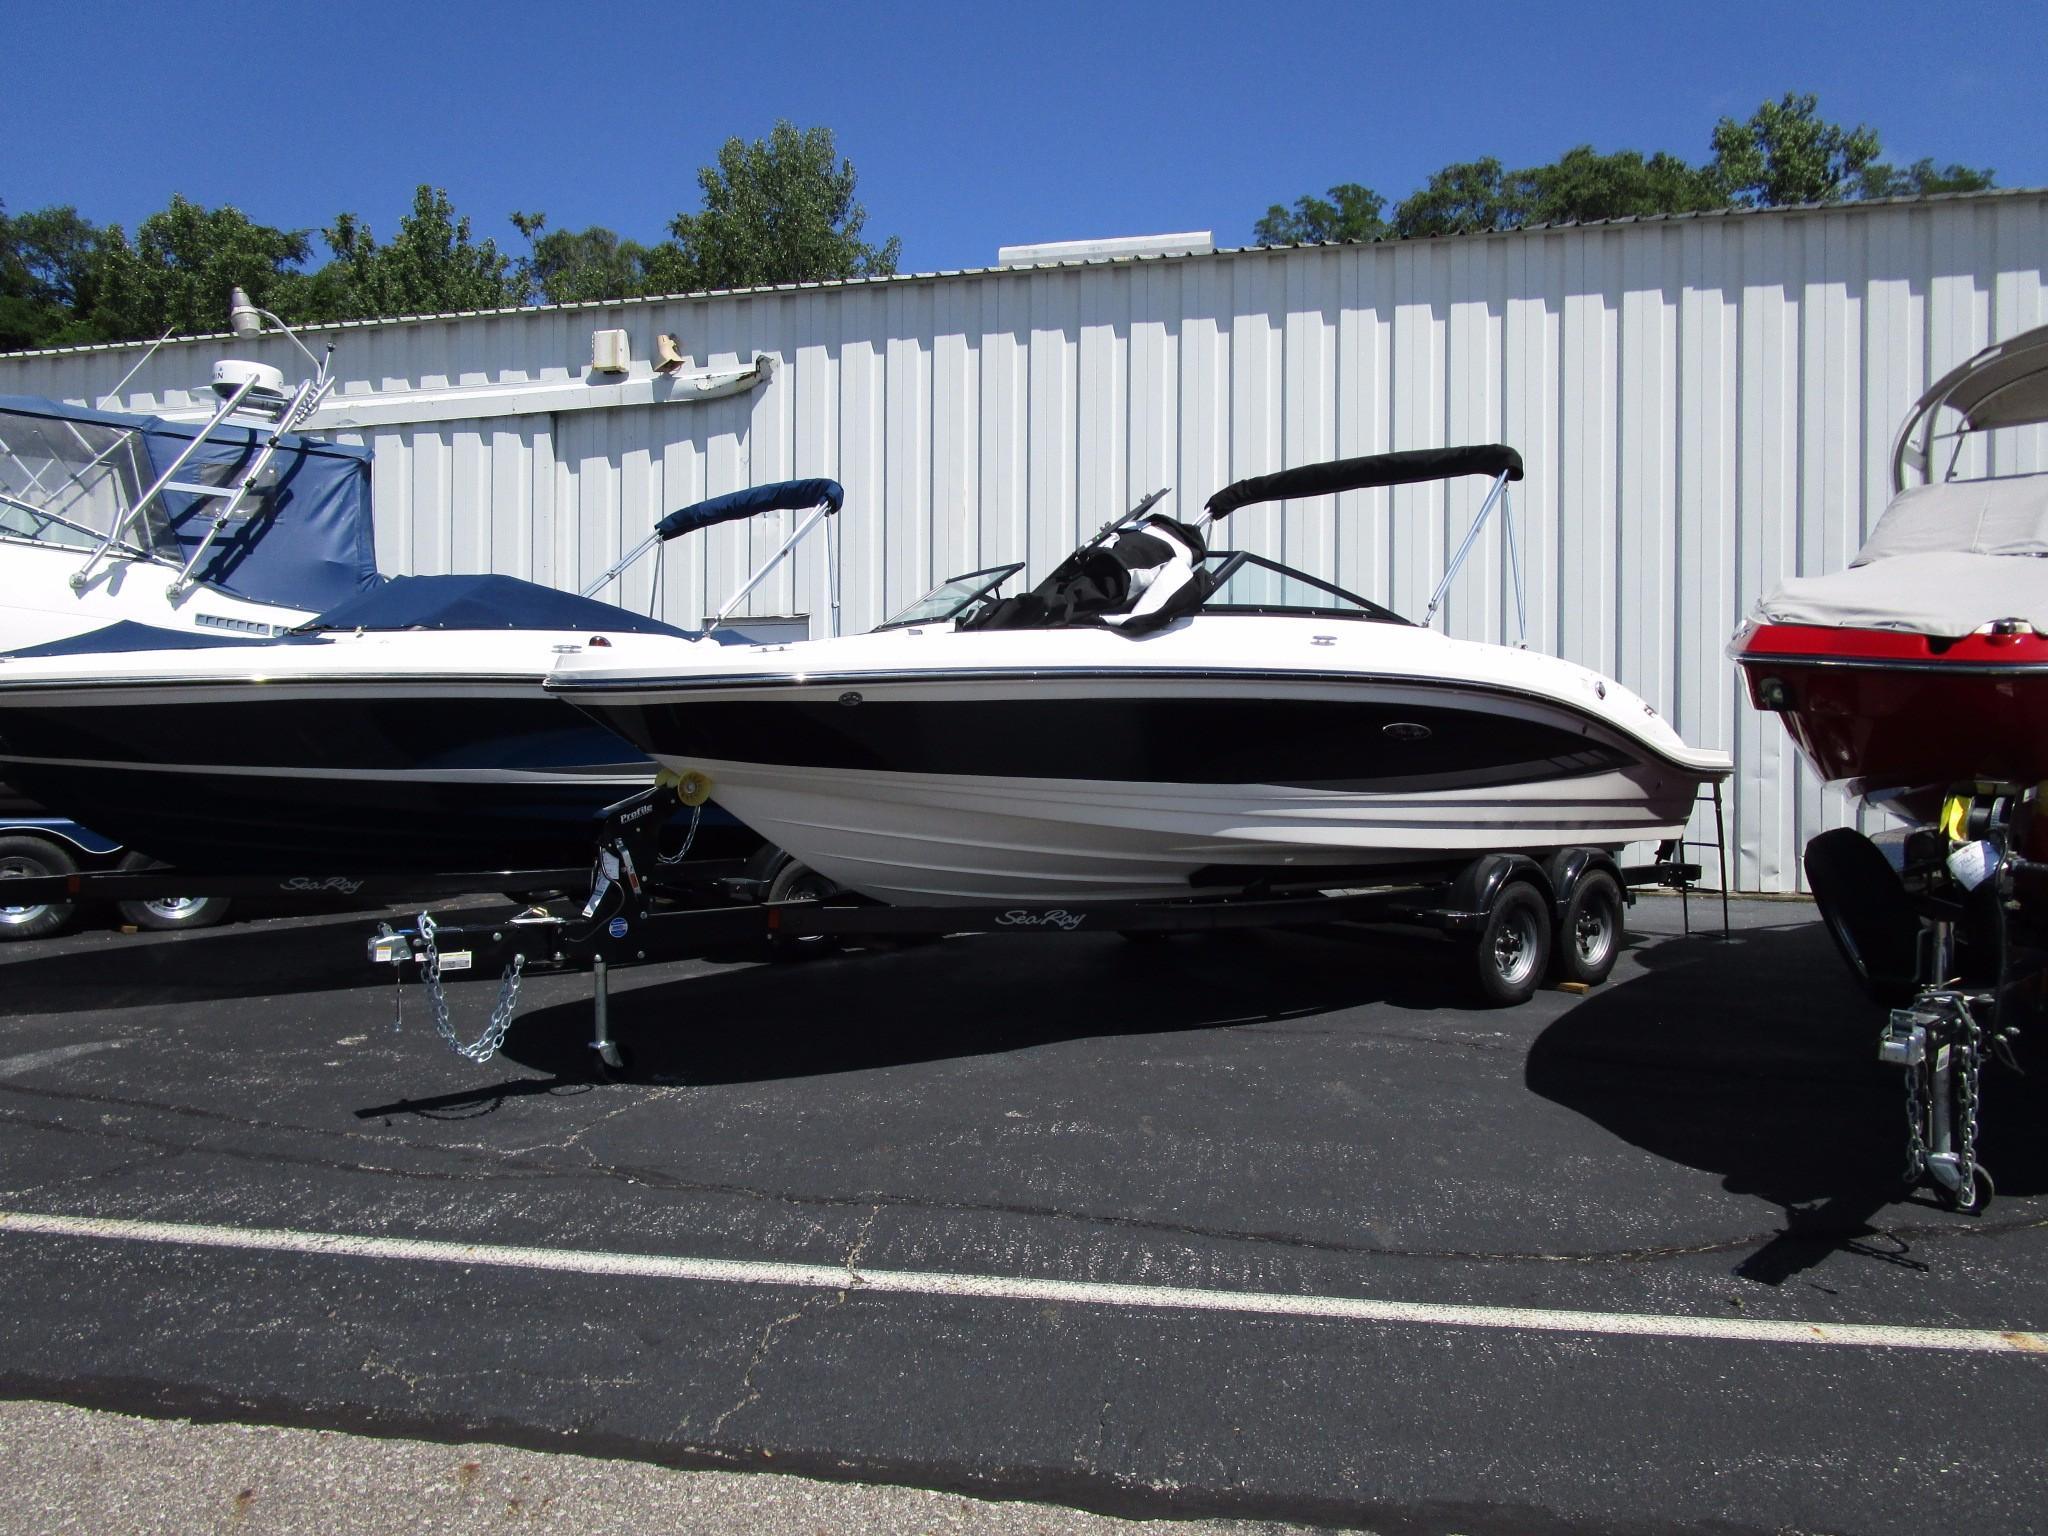 2017 Sea Ray 21 Spx Power Boat For Sale Www Yachtworld Com